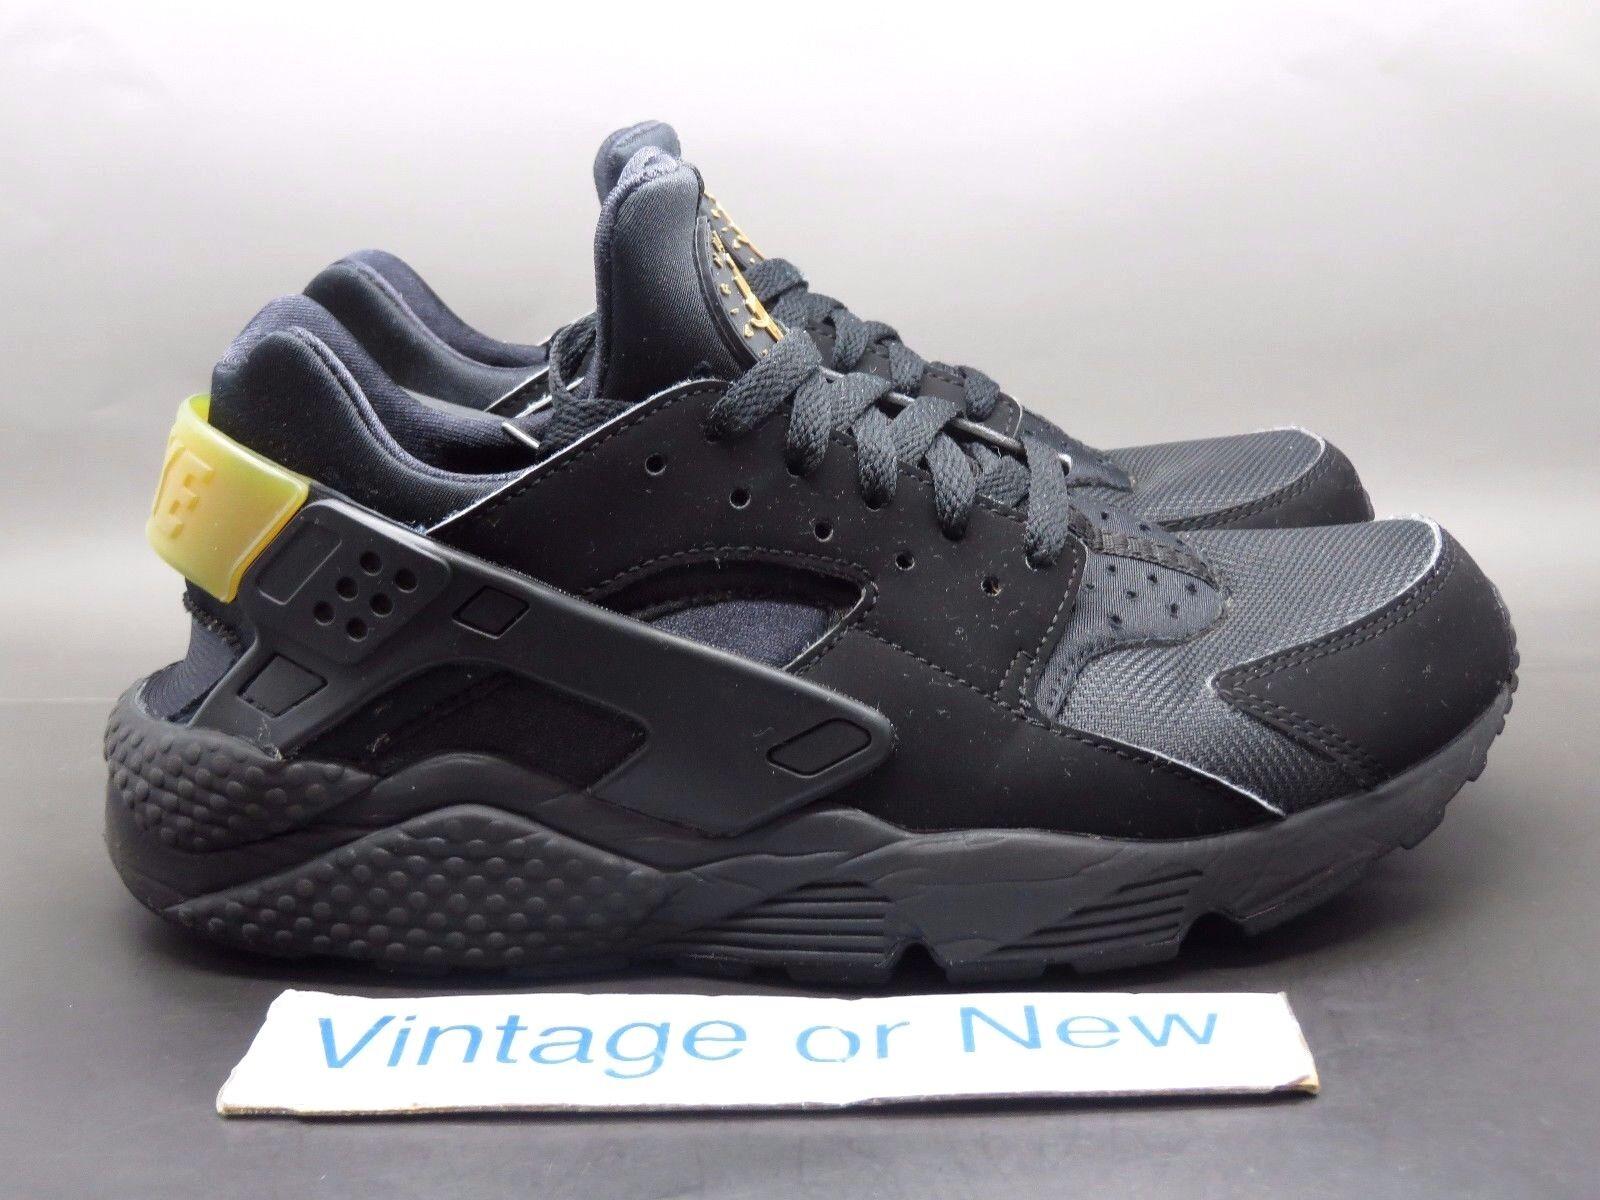 Men's Nike Metallic Air Huarache Run Black Metallic Nike Gold Medal Running Shoes sz 8 e2a14e